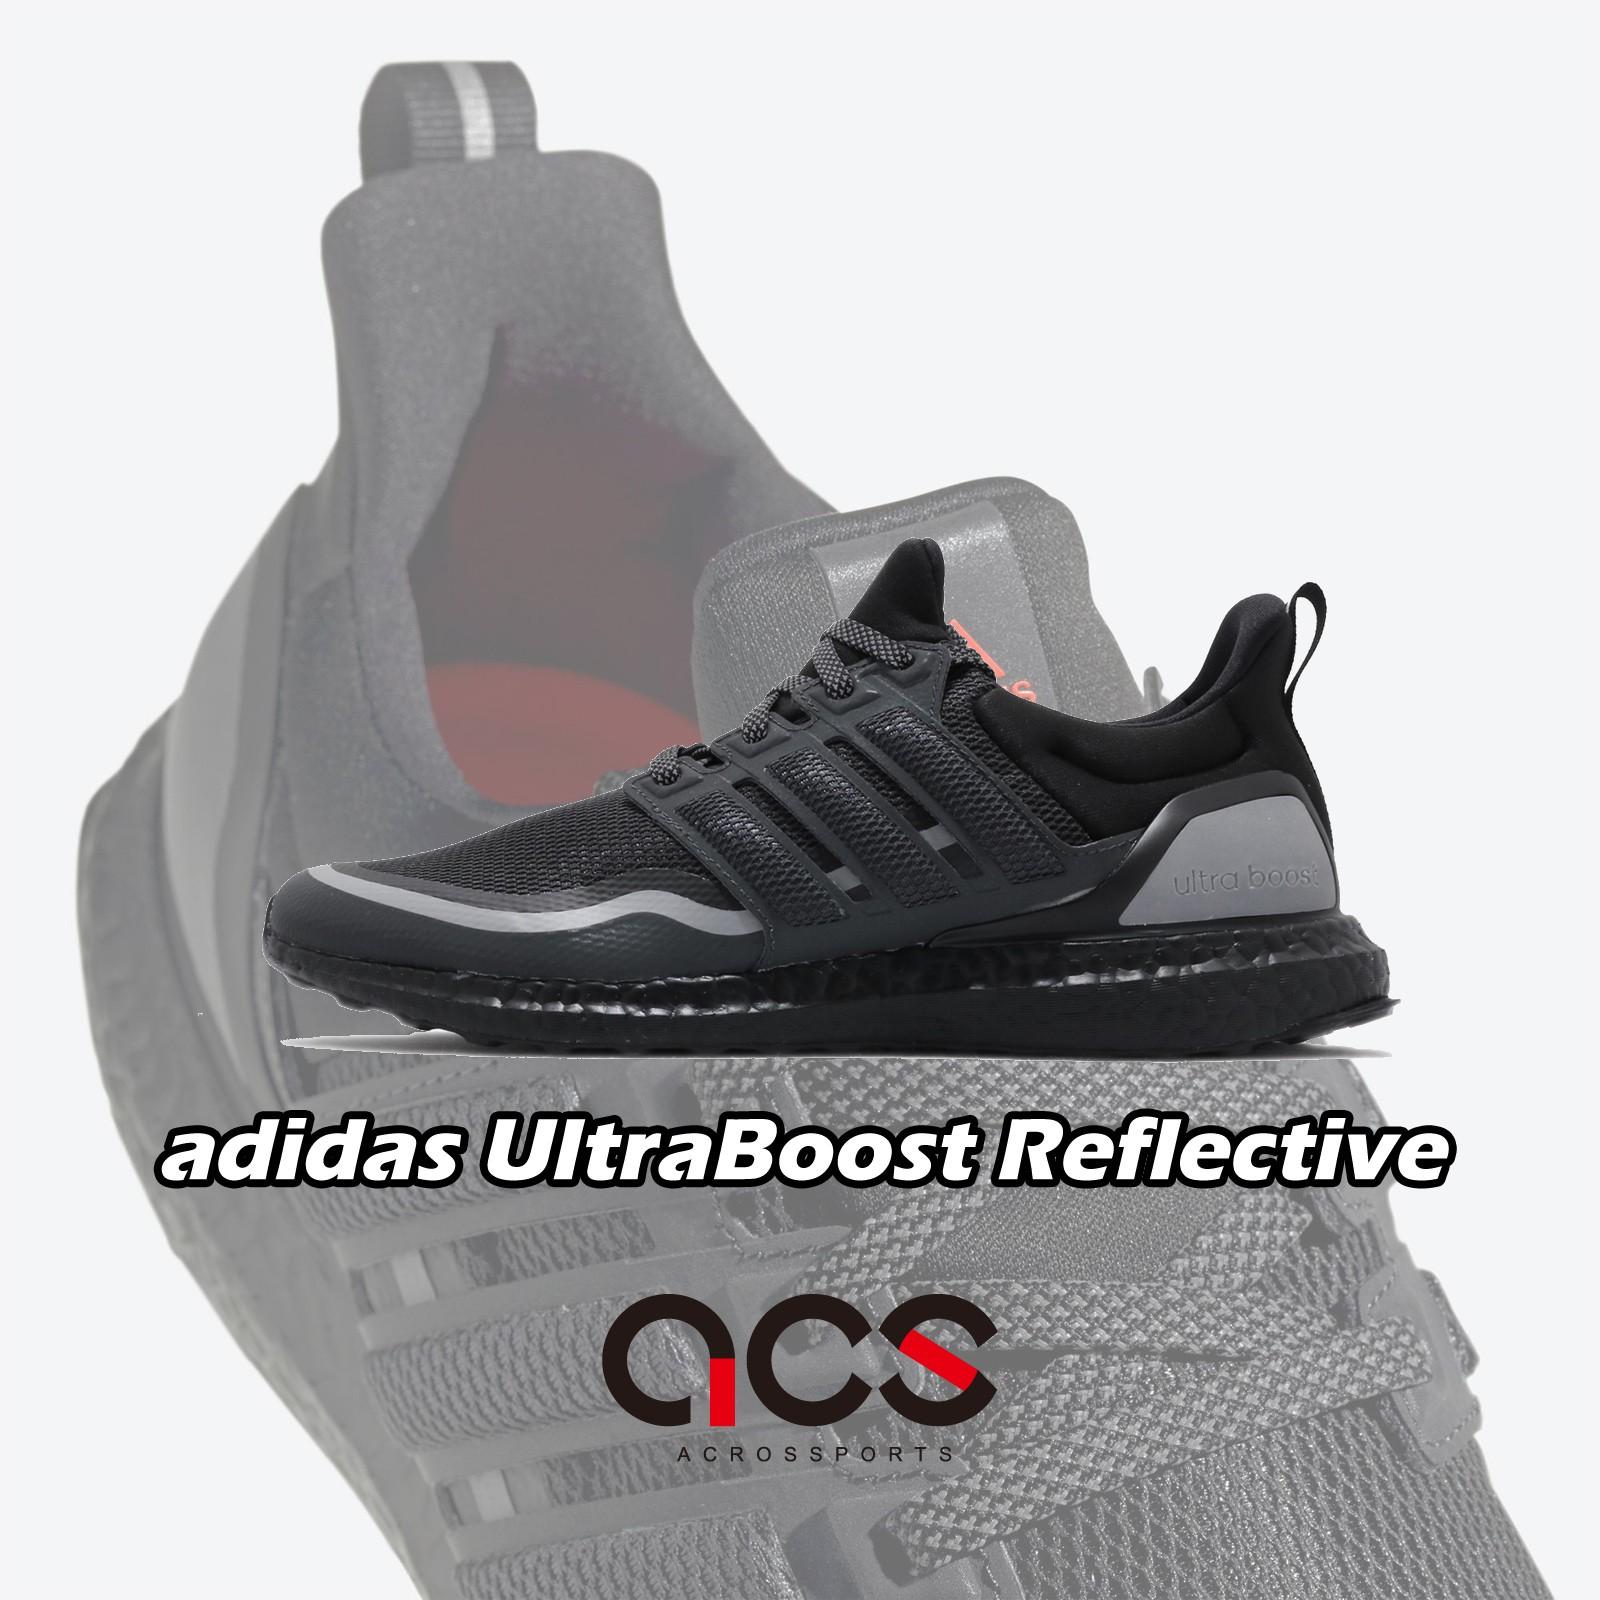 adidas 慢跑鞋 UltraBOOST Reflective 黑 灰 男鞋 反光 運動鞋 EG8105 【ACS】